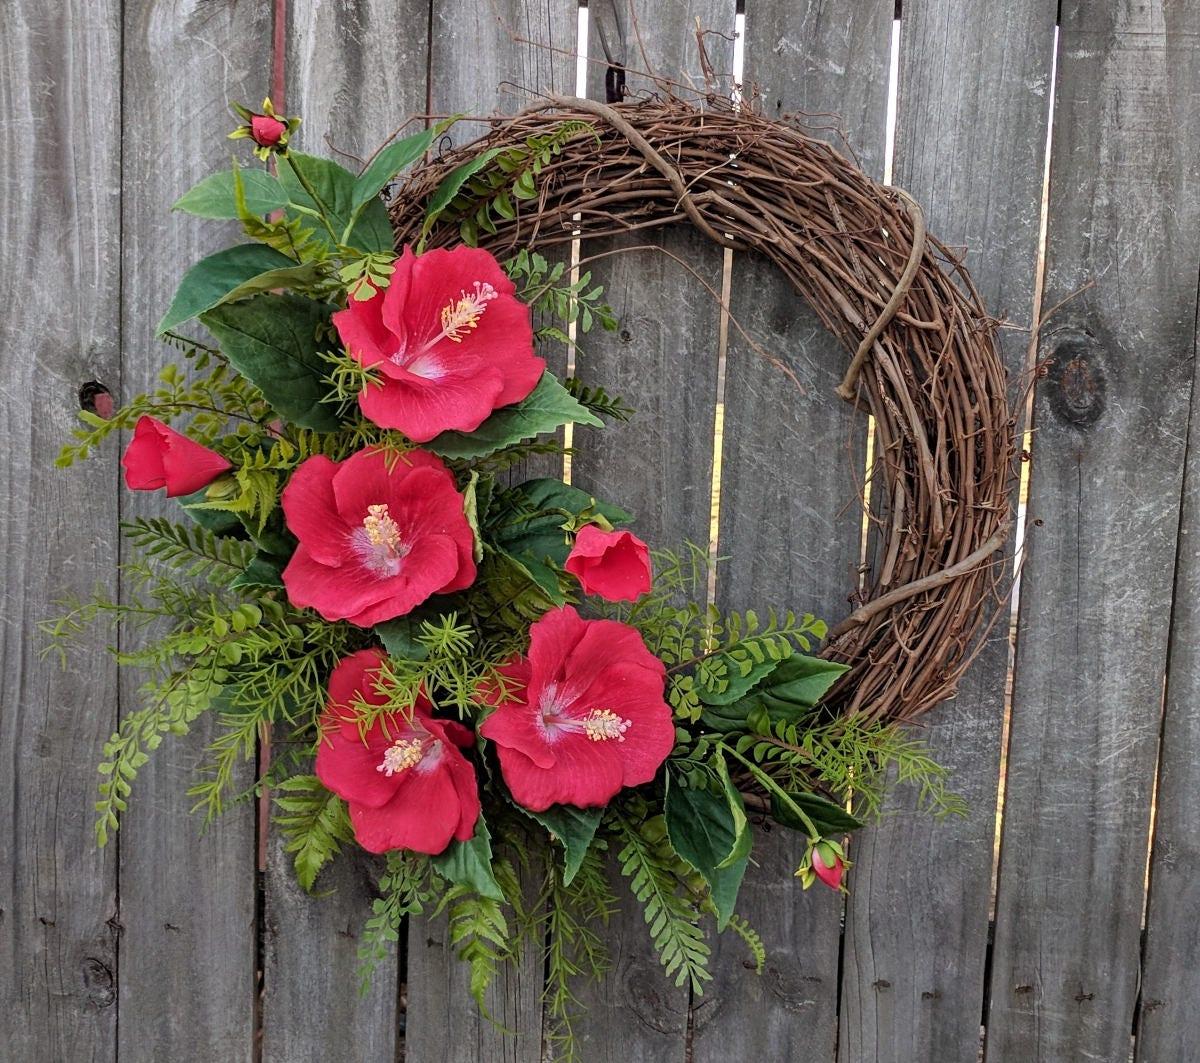 Tropical Hibiscus Wreath Realistic Hibiscus Fern Wreath Spring Summer Wreath Red Hibiscus Bloom Wreath Horn S Handmade Wreath